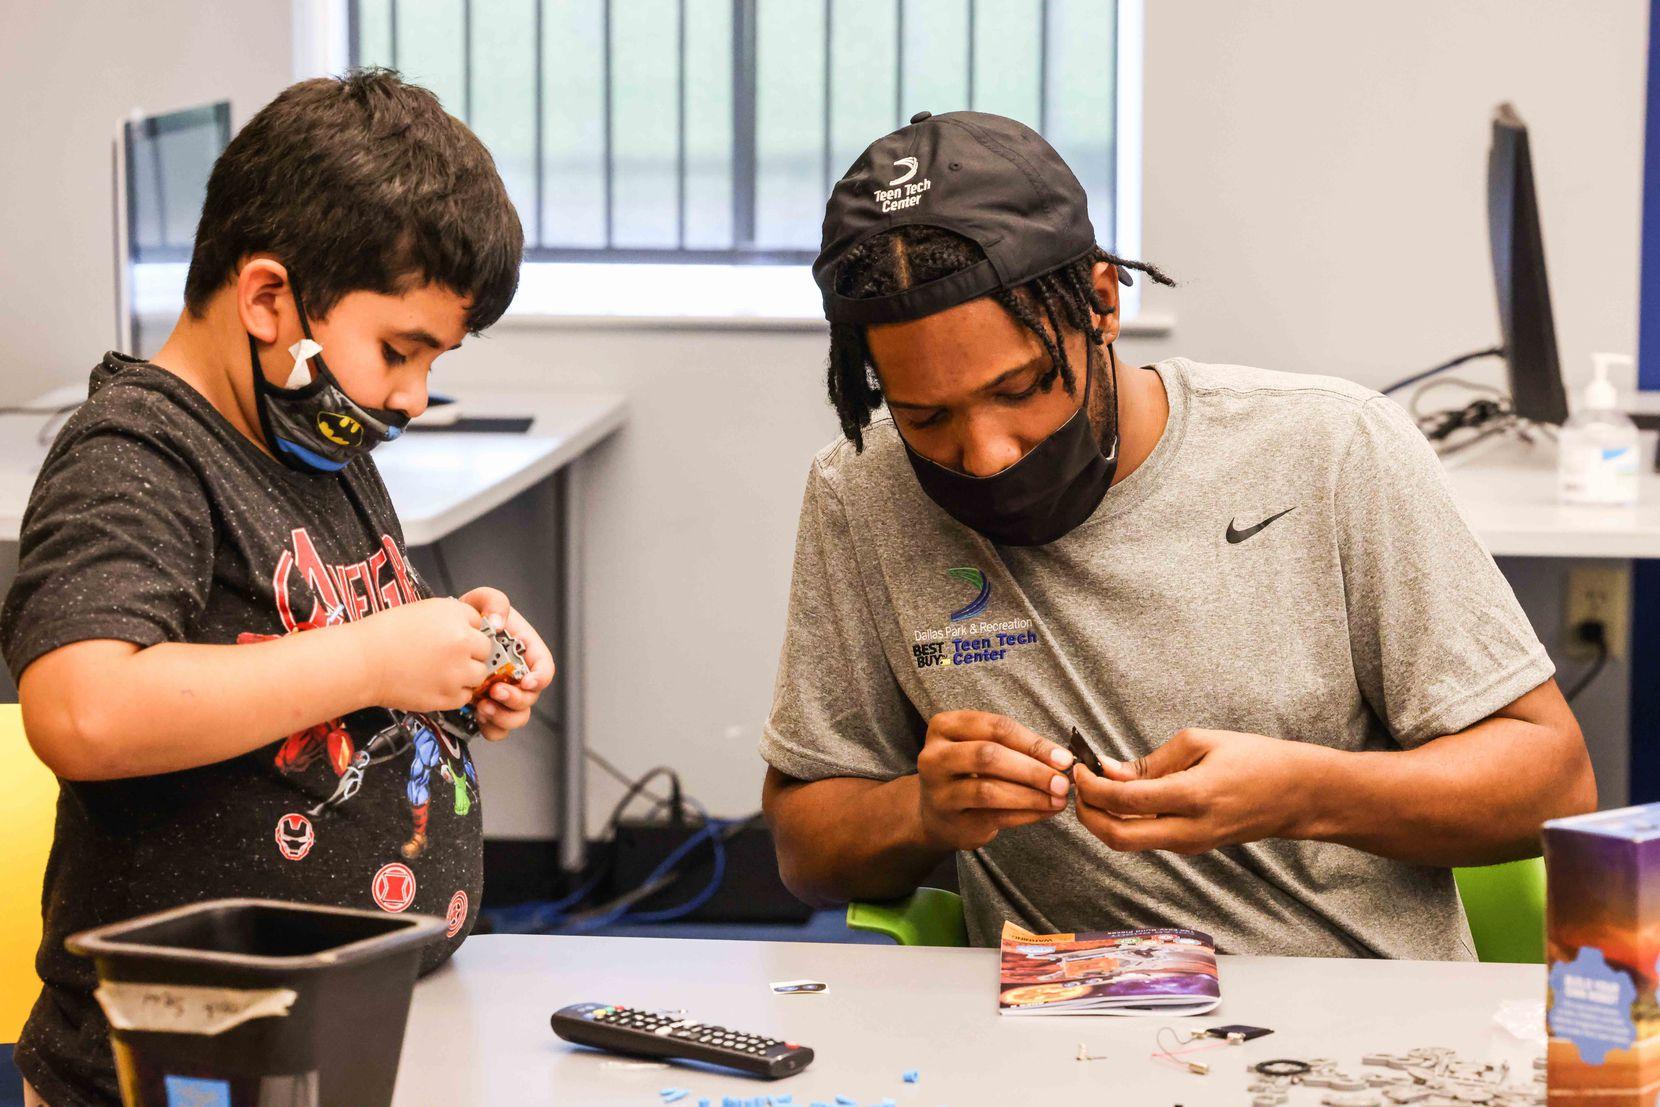 Lorenzo Reid-Deloatche works Jadin Torres, as part of the Children's Technology Program at the Juanita J. Craft Recreation Center Annex in Dallas on Thursday, June 10, 2021.